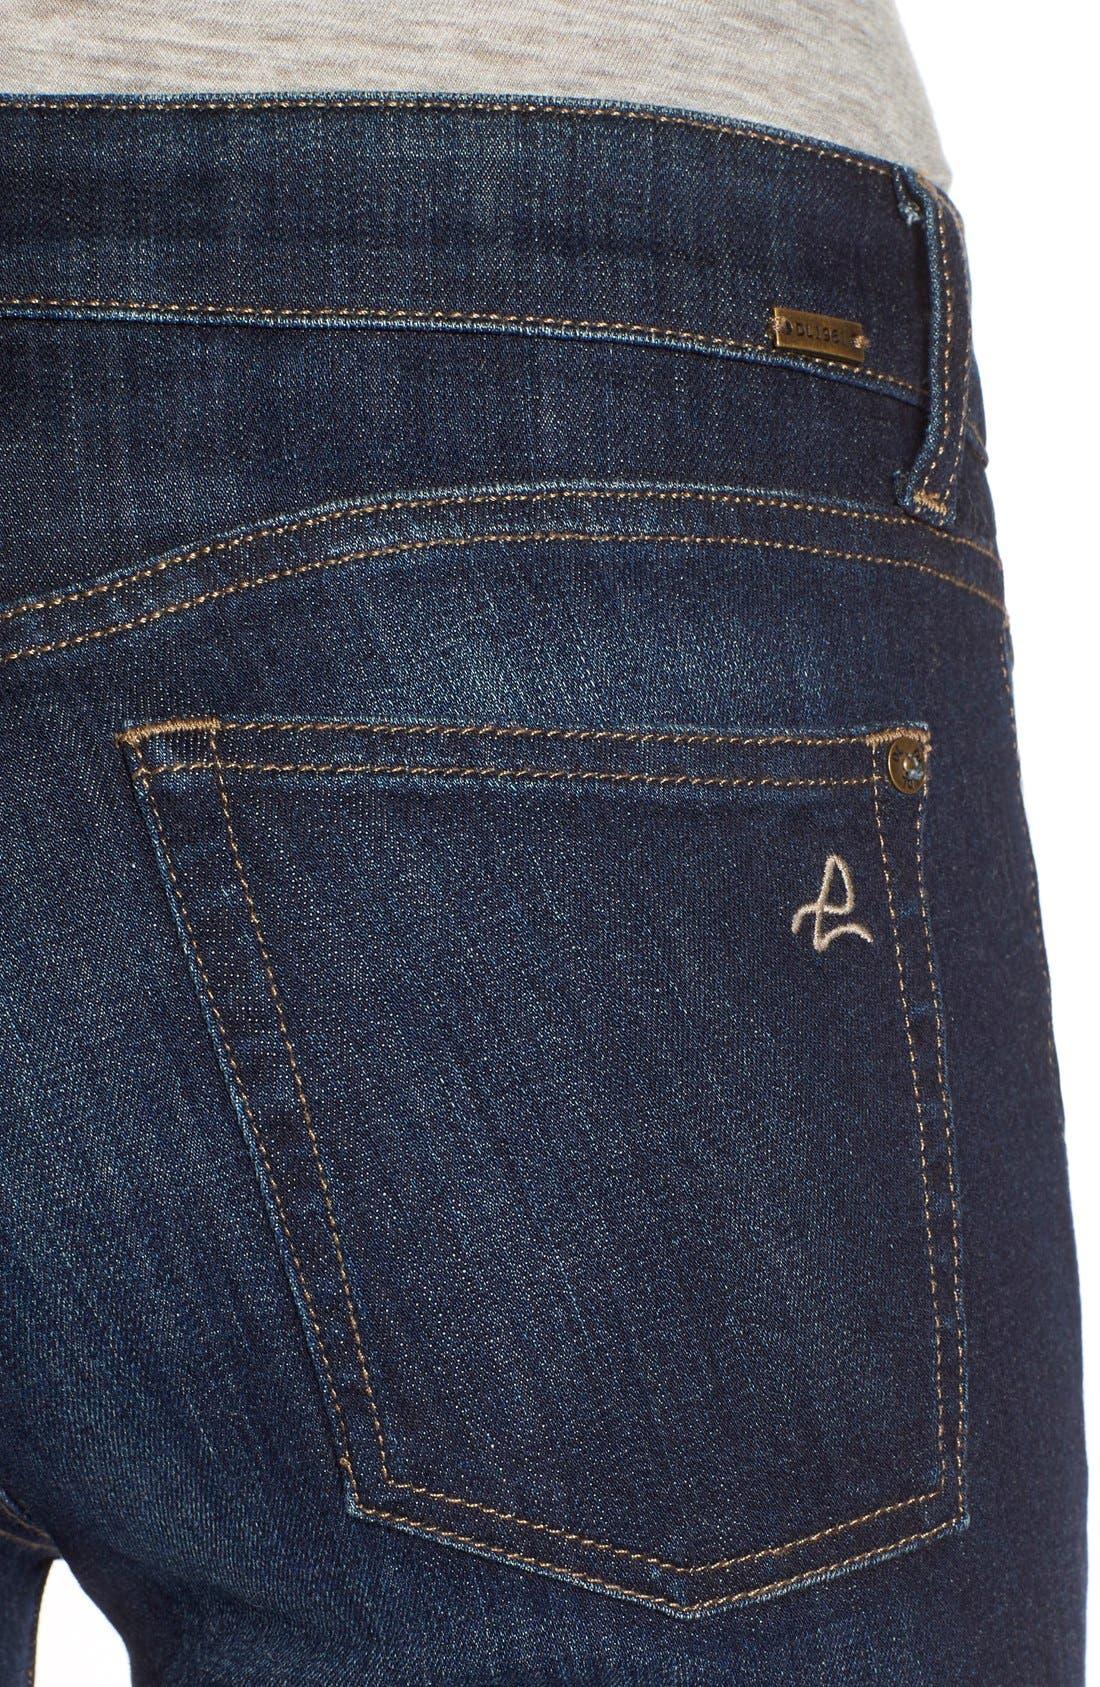 'Danny' Instasculpt Skinny Jeans,                             Alternate thumbnail 3, color,                             PULSE